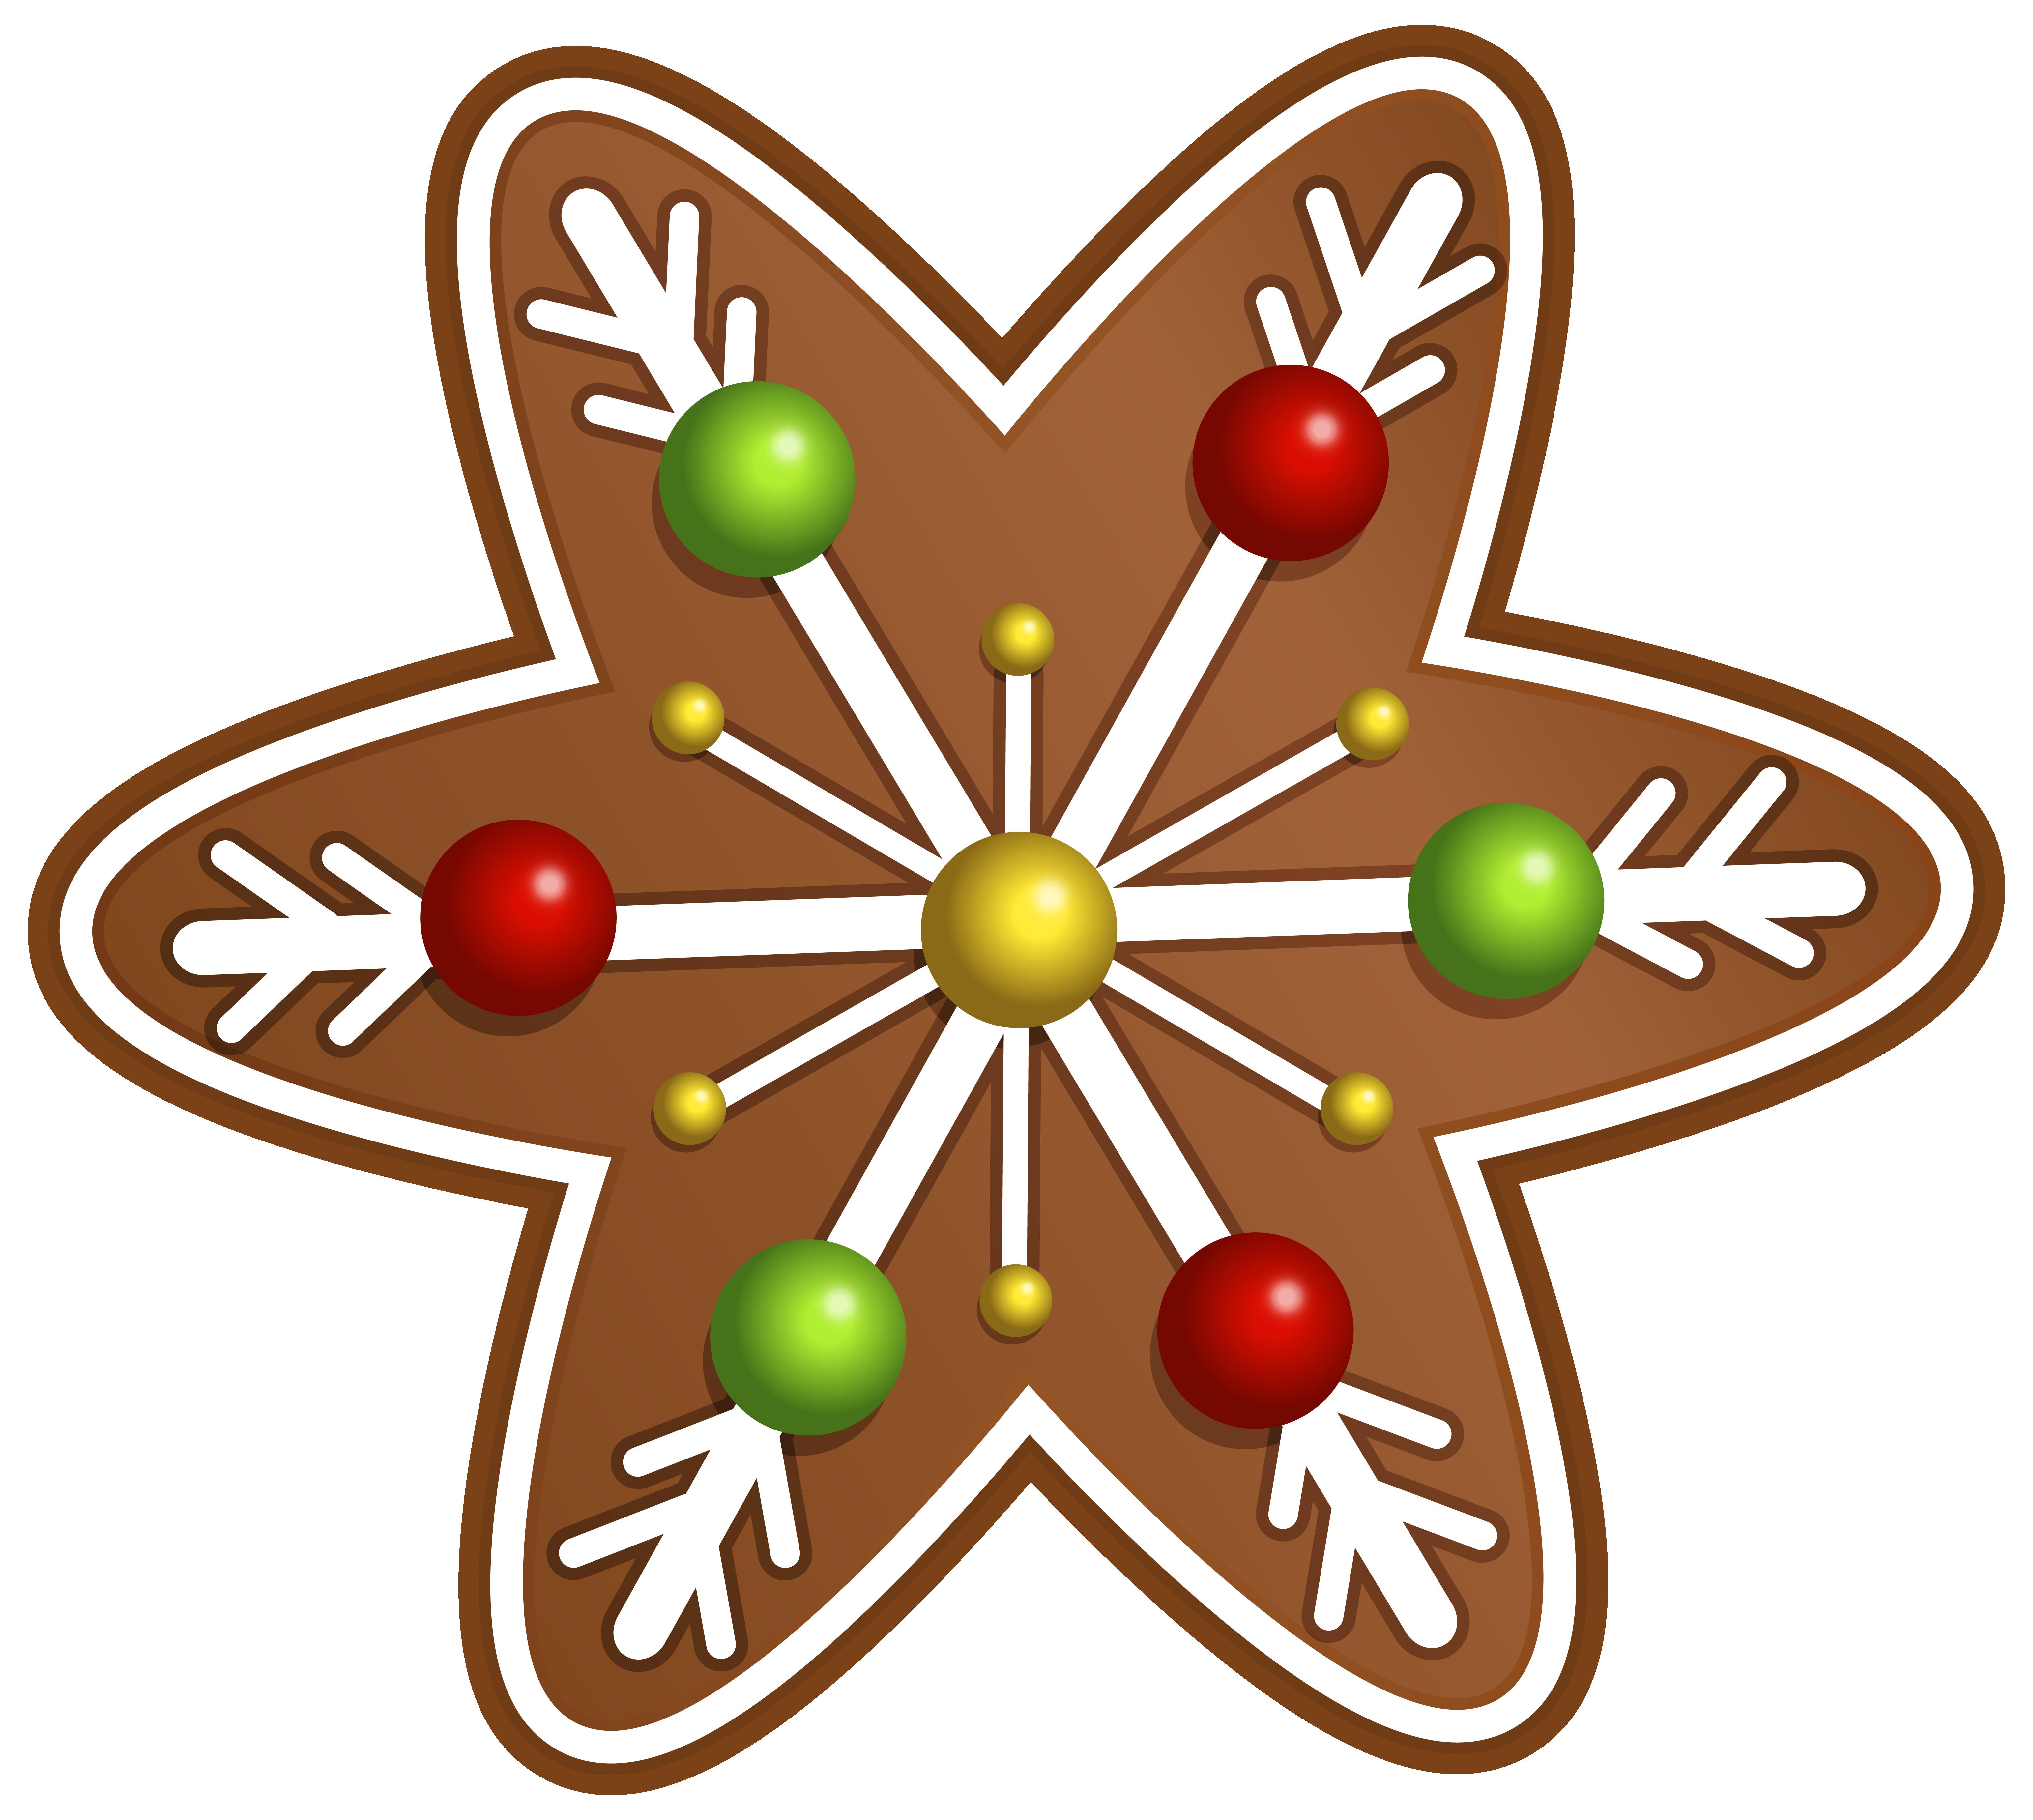 Christmas Cookies Clip Art - ClipArt Best